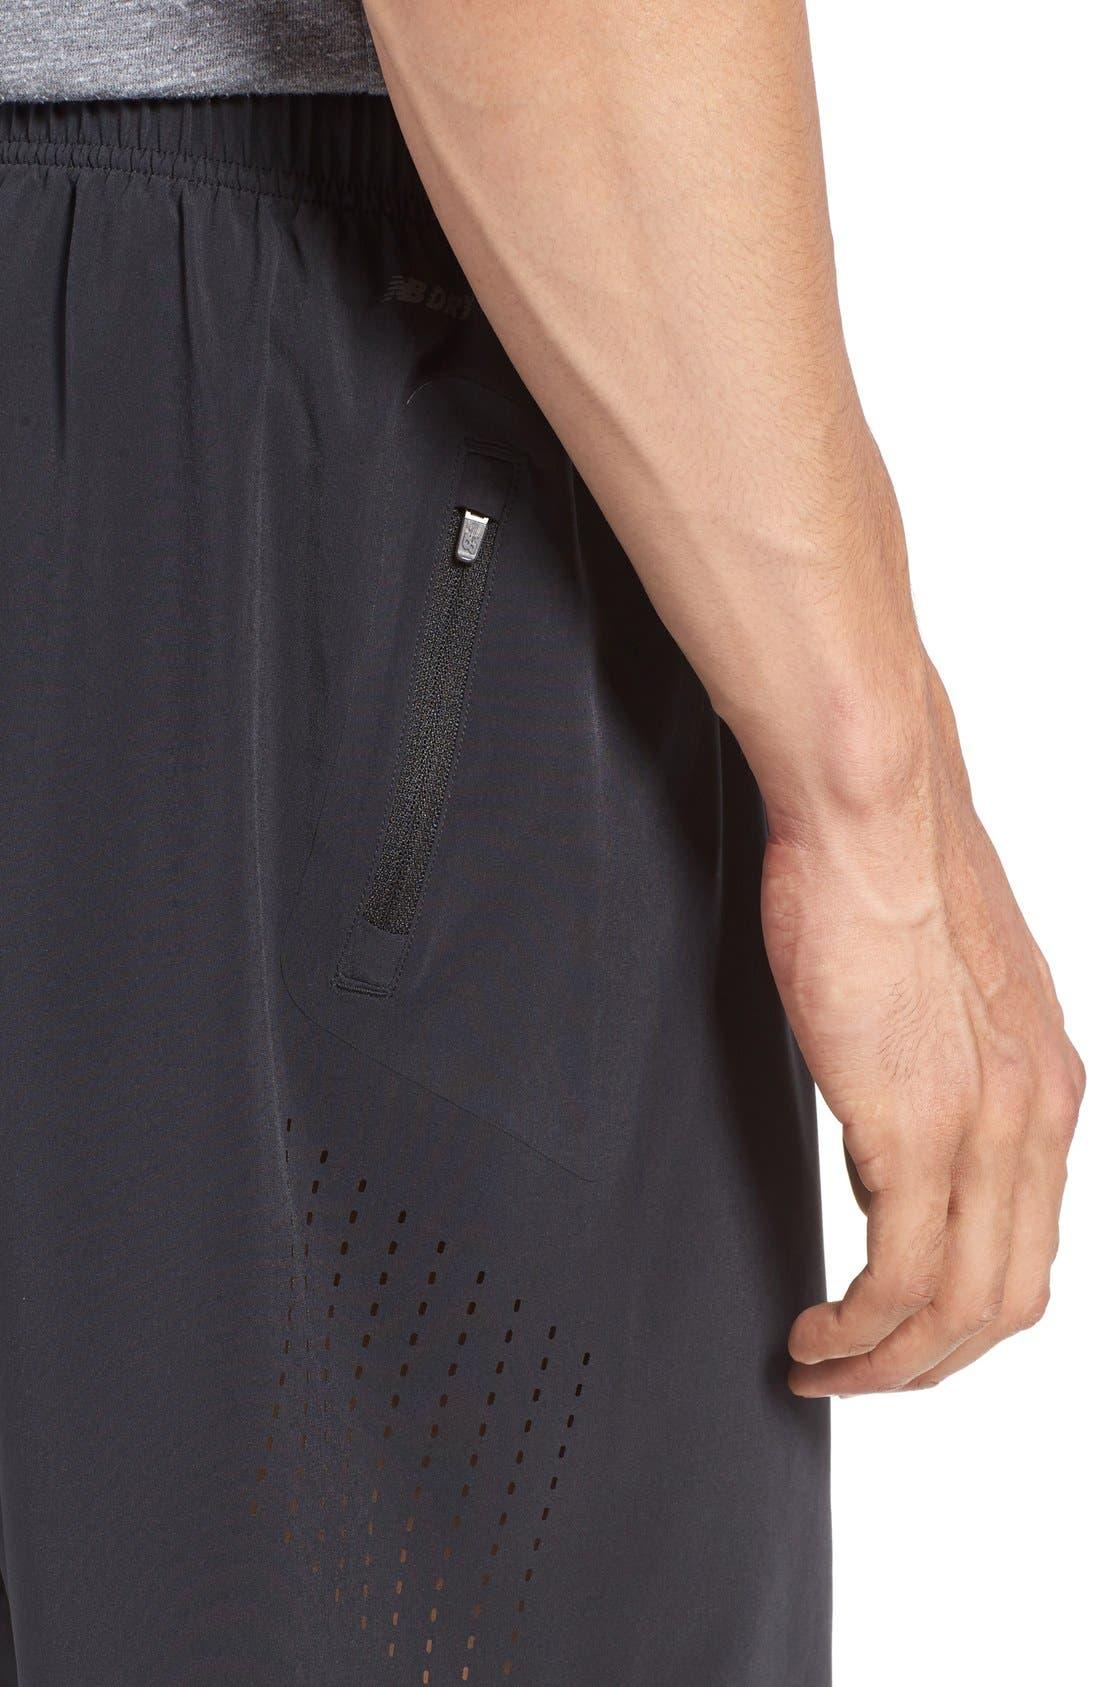 'Shift' Athletic Fit Training Shorts,                             Alternate thumbnail 4, color,                             Black